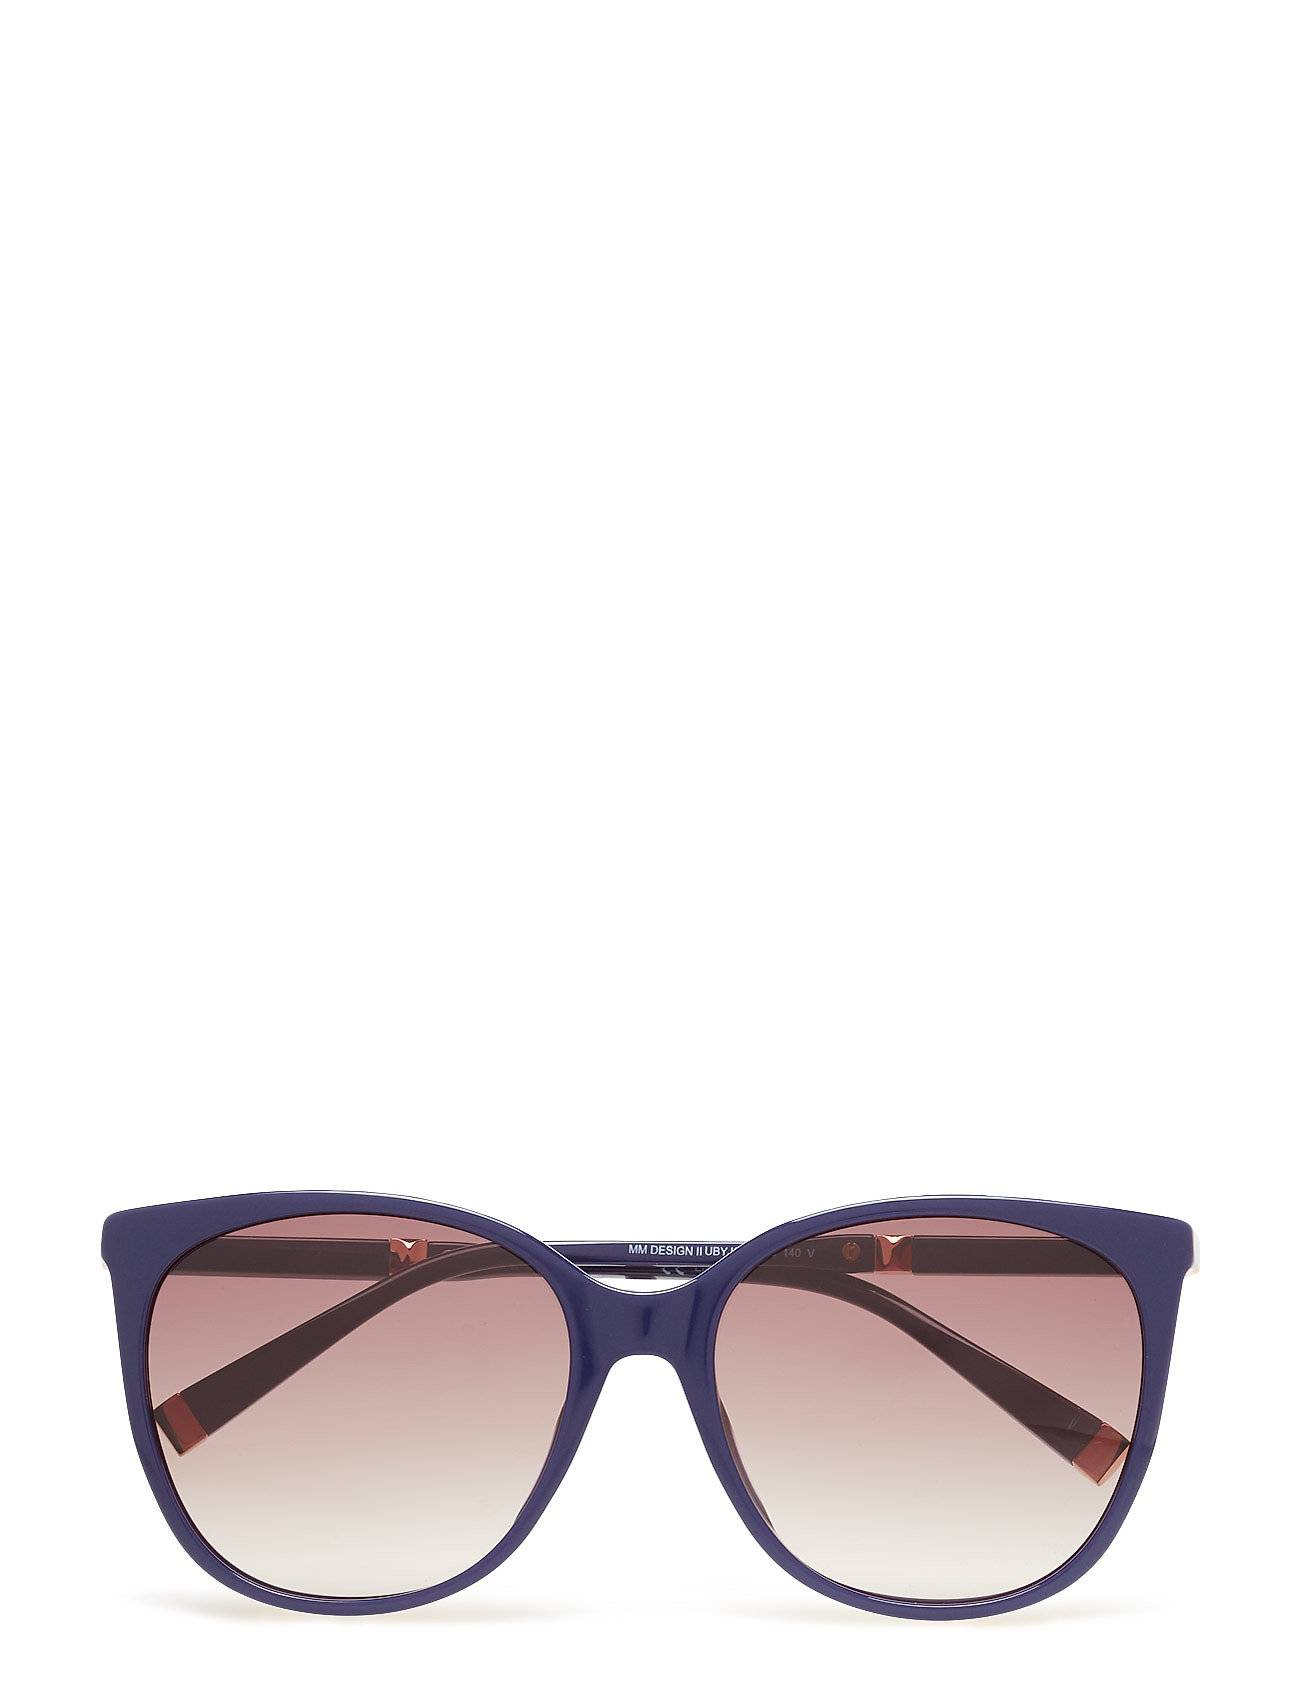 MAXMARA Sunglasses Mm Design Ii